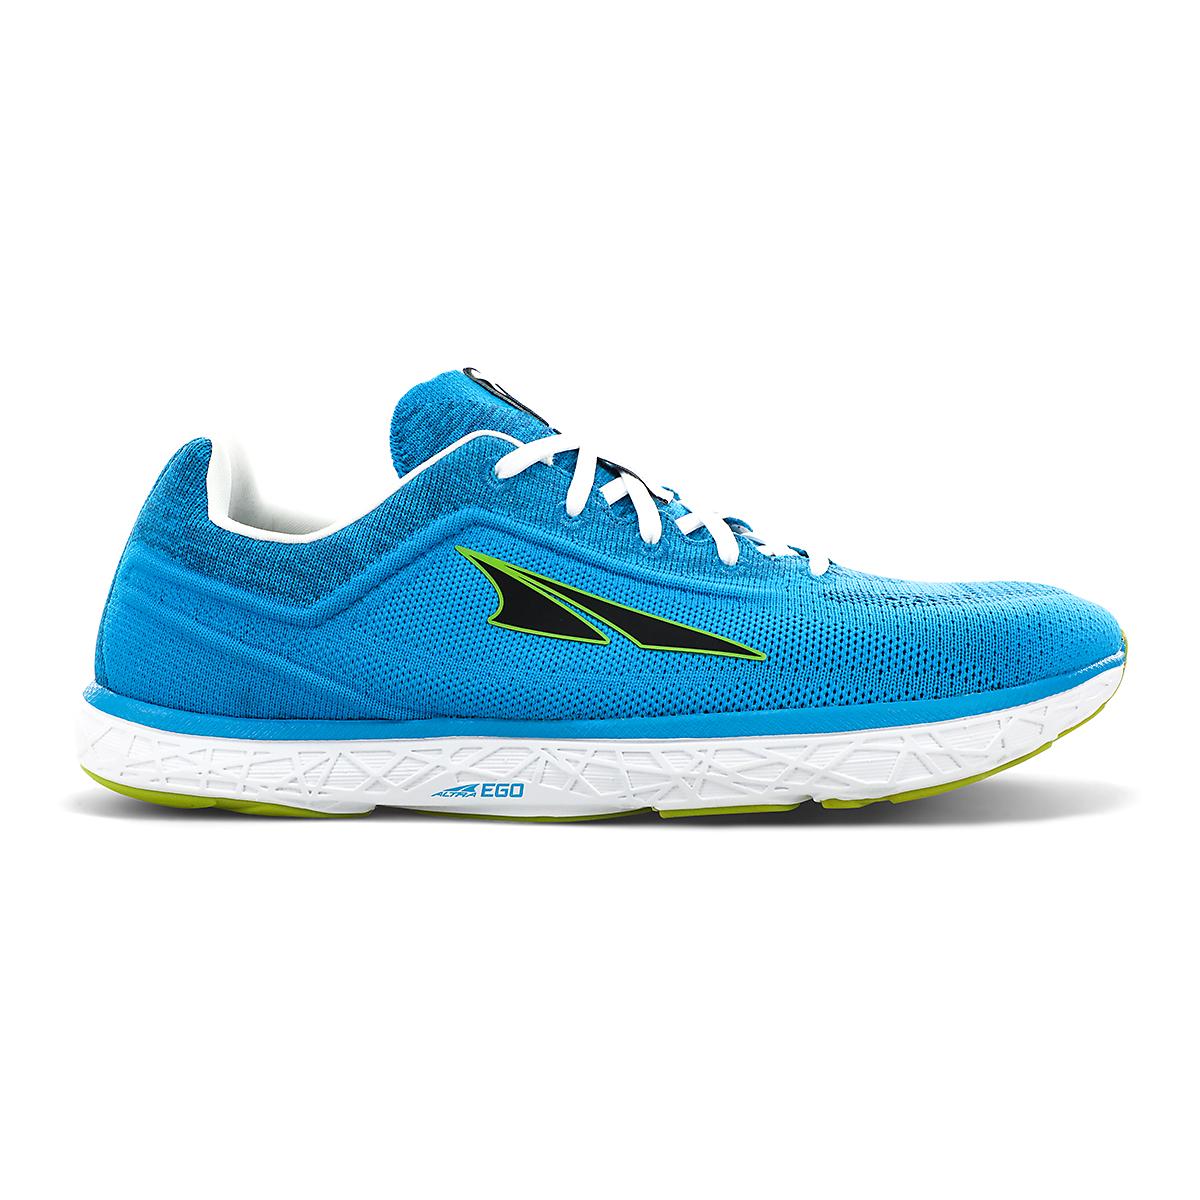 Men's Altra Escalante 2.5 Running Shoe - Color: Blue/Lime - Size: 7 - Width: Regular, Blue/Lime, large, image 1